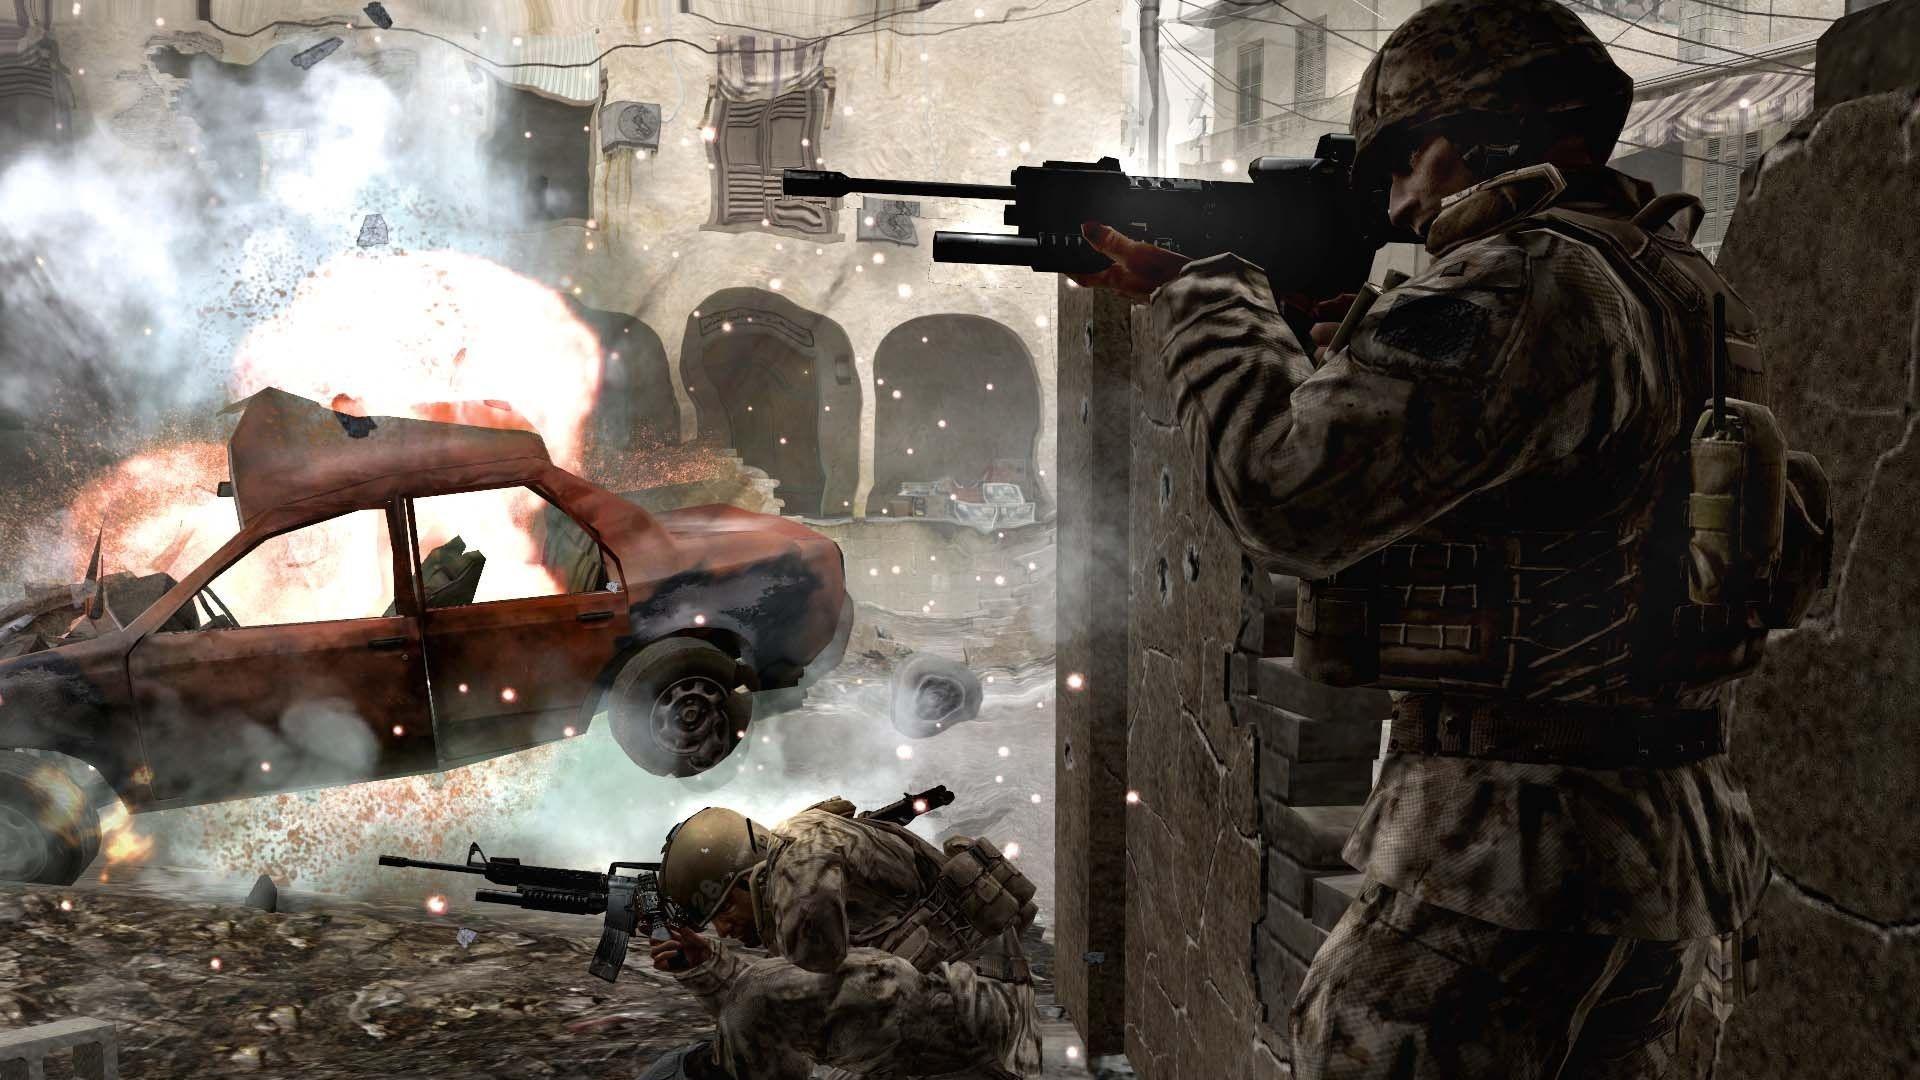 Download Wallpaper 1920x1080 Call Of Duty 4 Modern Warfare Soldiers